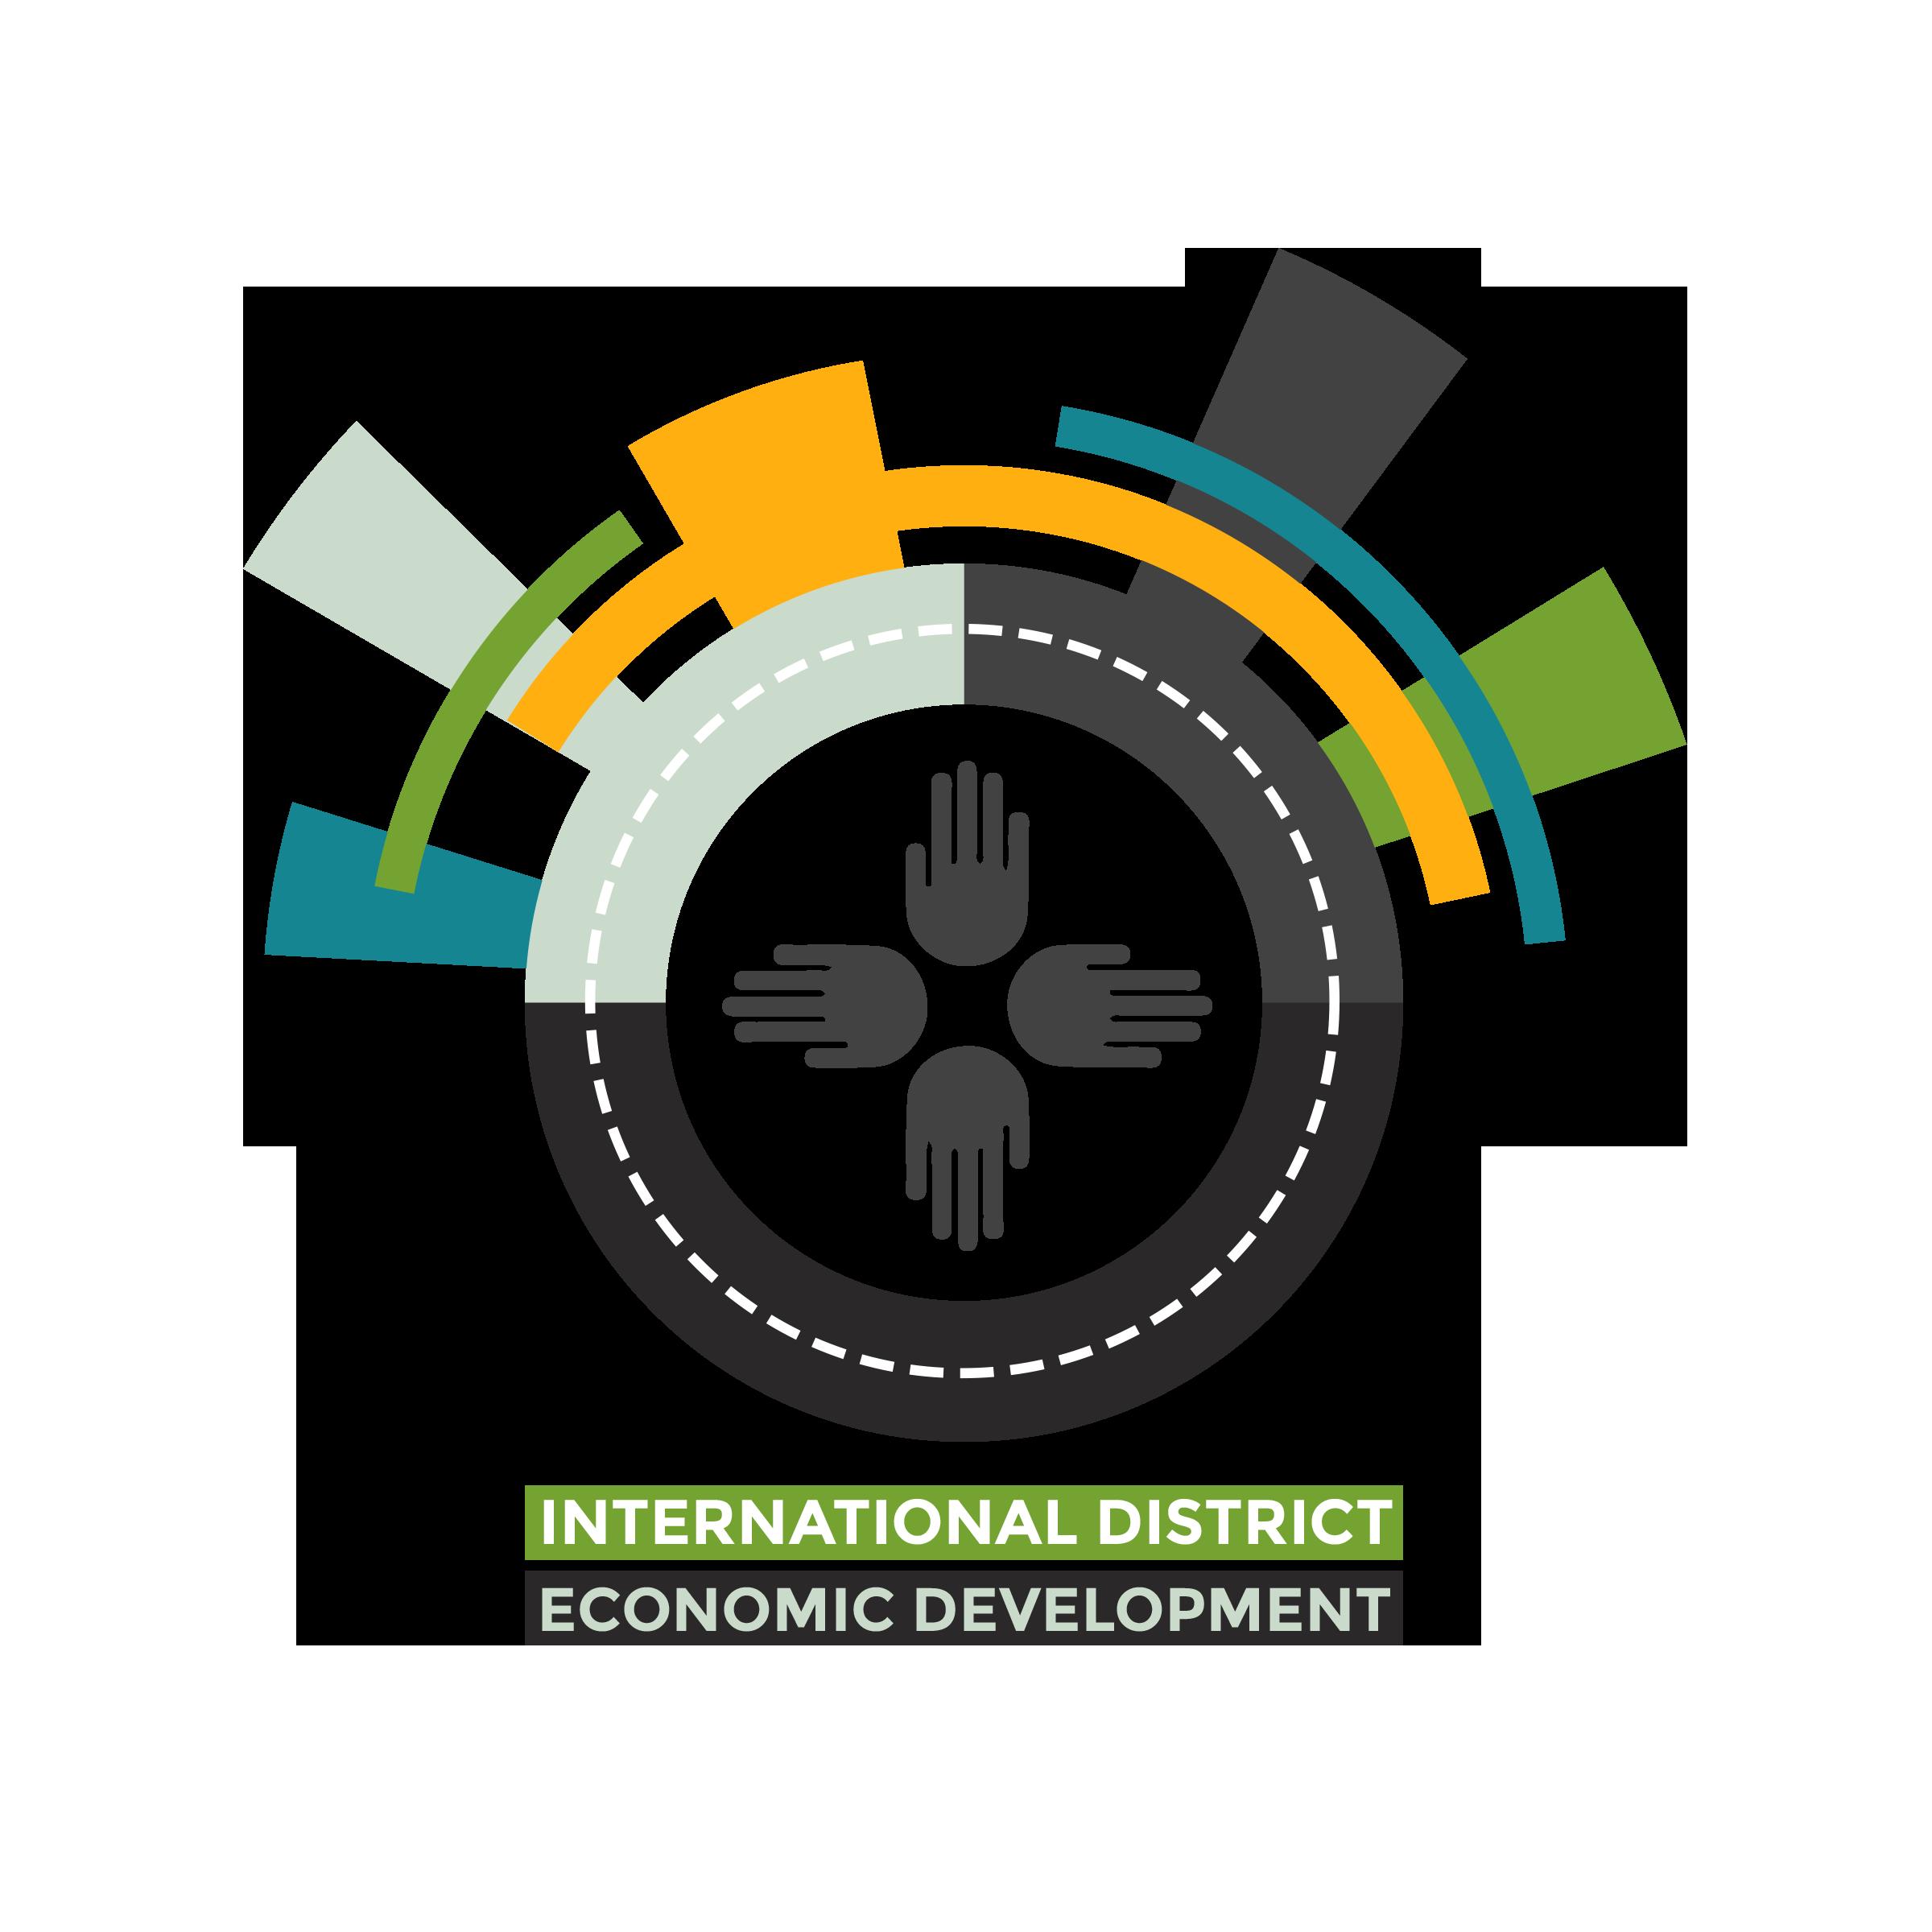 International District Economic Development